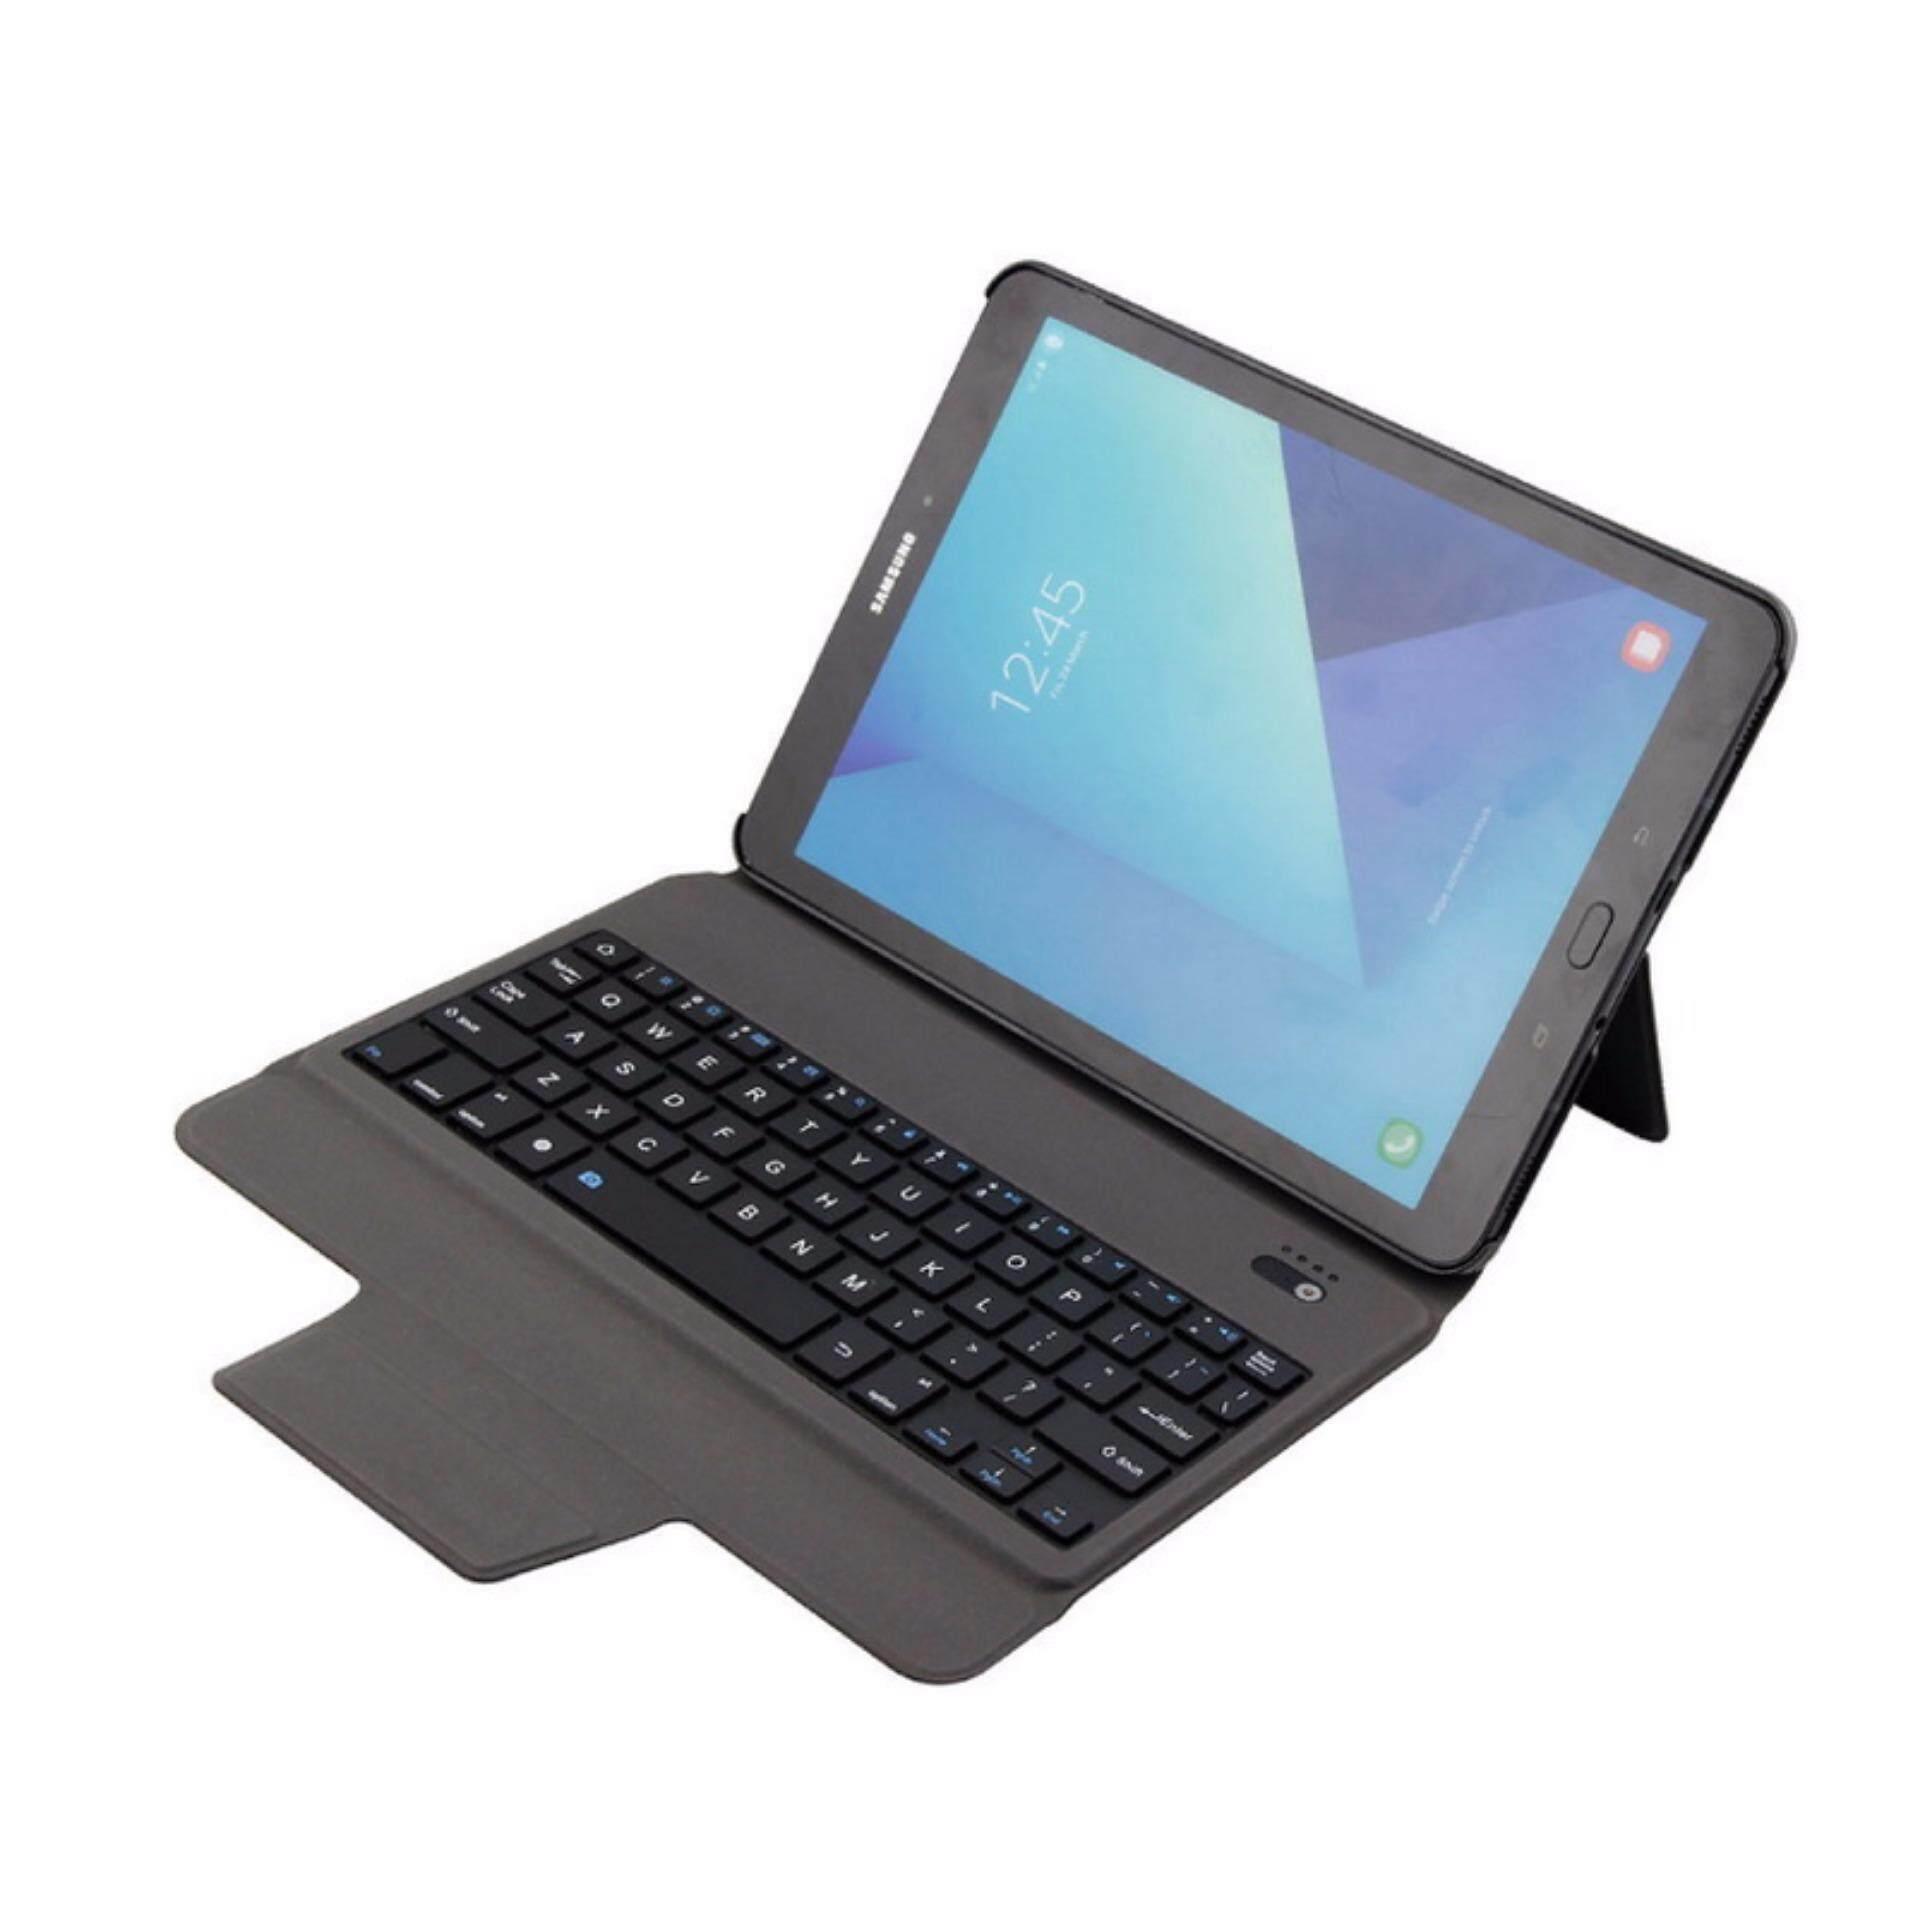 Rongnew Terbaru Ultra Ramping Keyboard Bluetooth dengan Case Kulit Penutup untuk Samsung Galaxy Tab S3 9.7 T820/T825. Emas